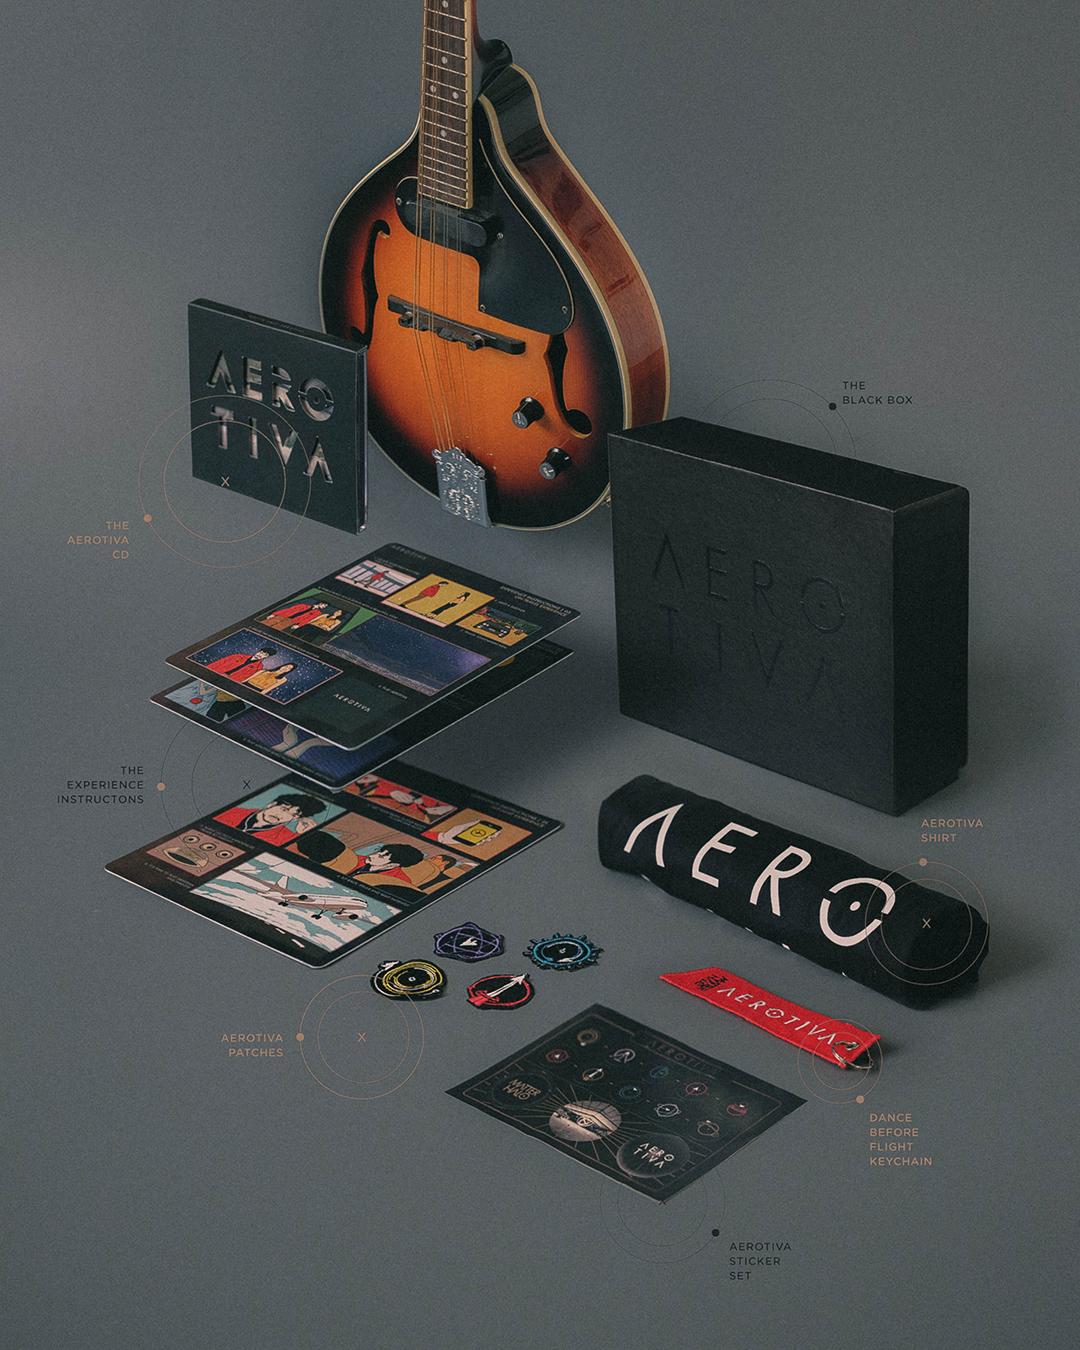 Aerotiva-The Black Box Poster-2017.jpg